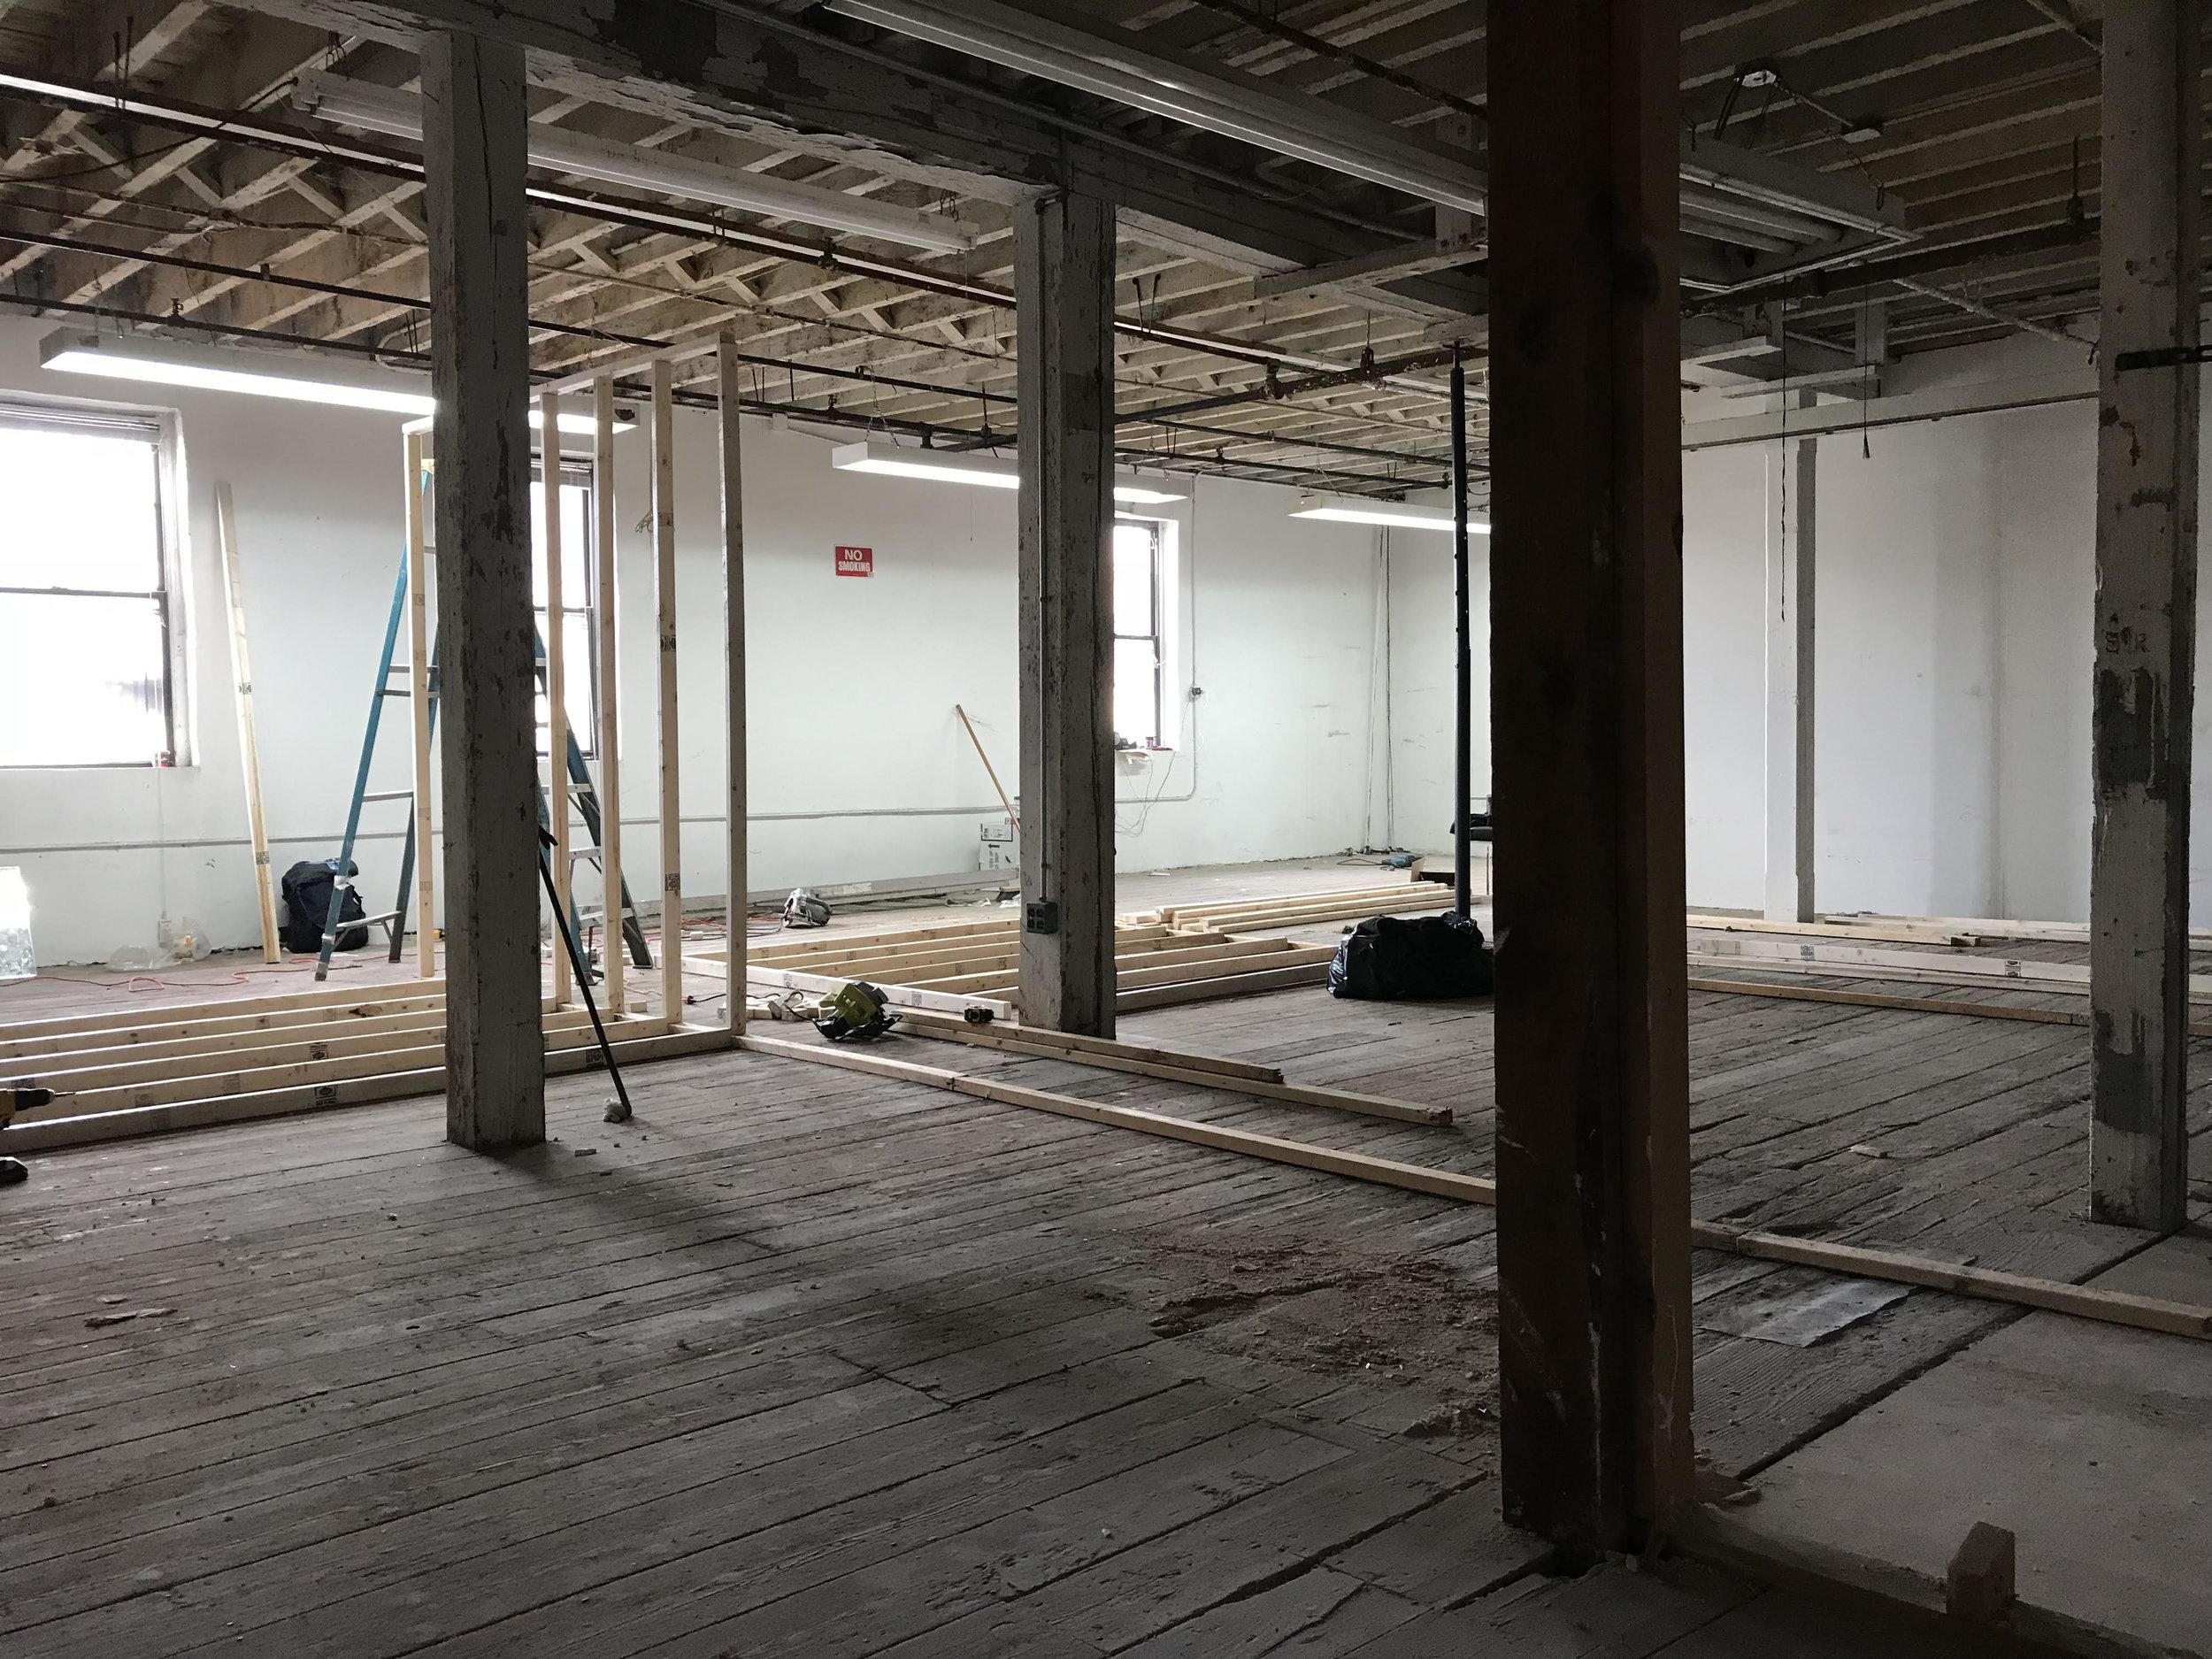 120 Waterbury Street, Brooklyn west wall (posted 27 March 2018, pre-renovation)